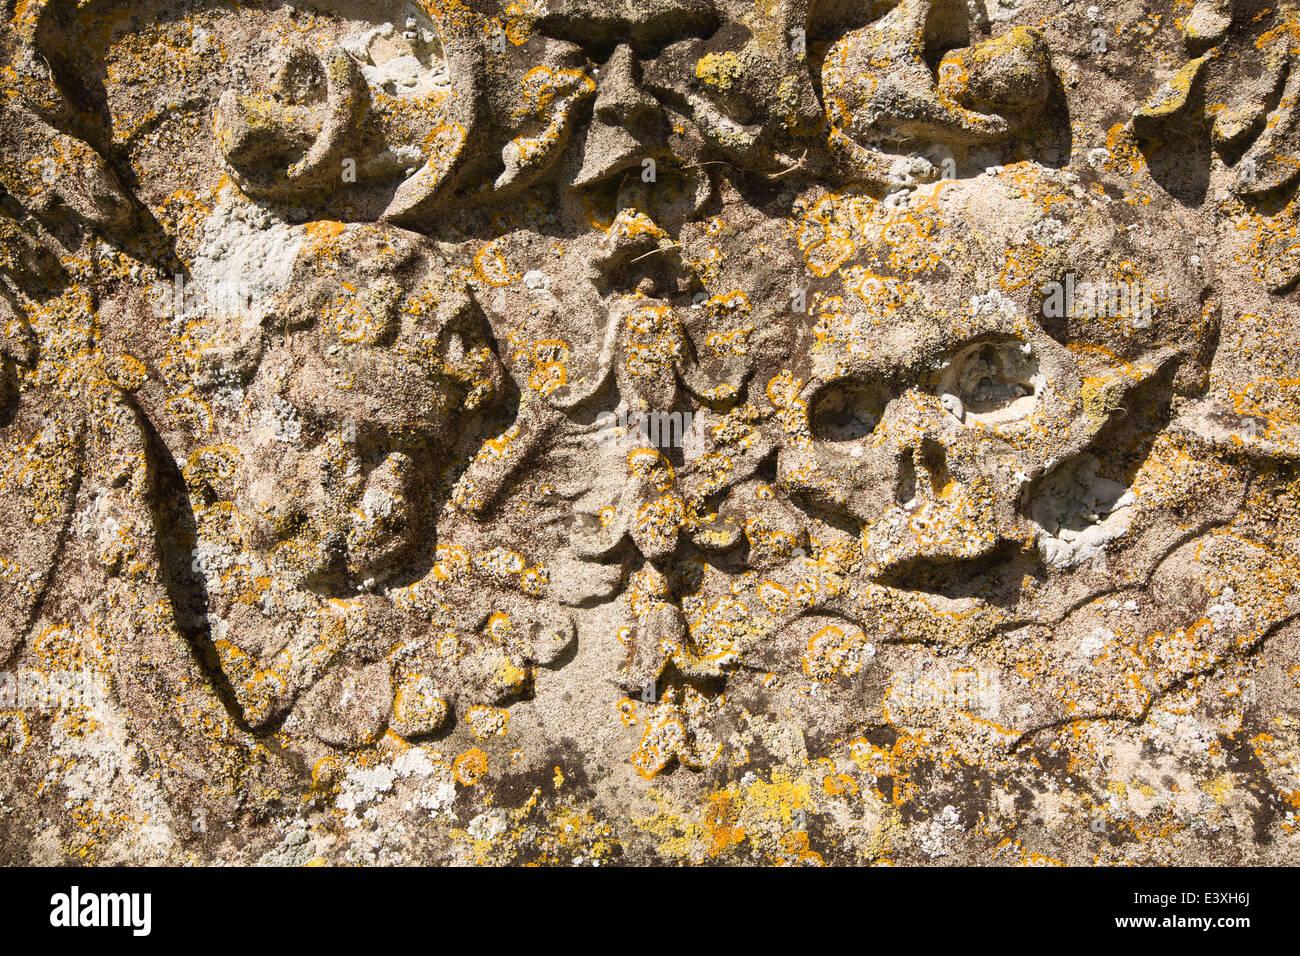 UK England, Suffolk, Lavenham, Parish Churchyard, lichen covered skull and cherub motif on gravestone - Stock Image